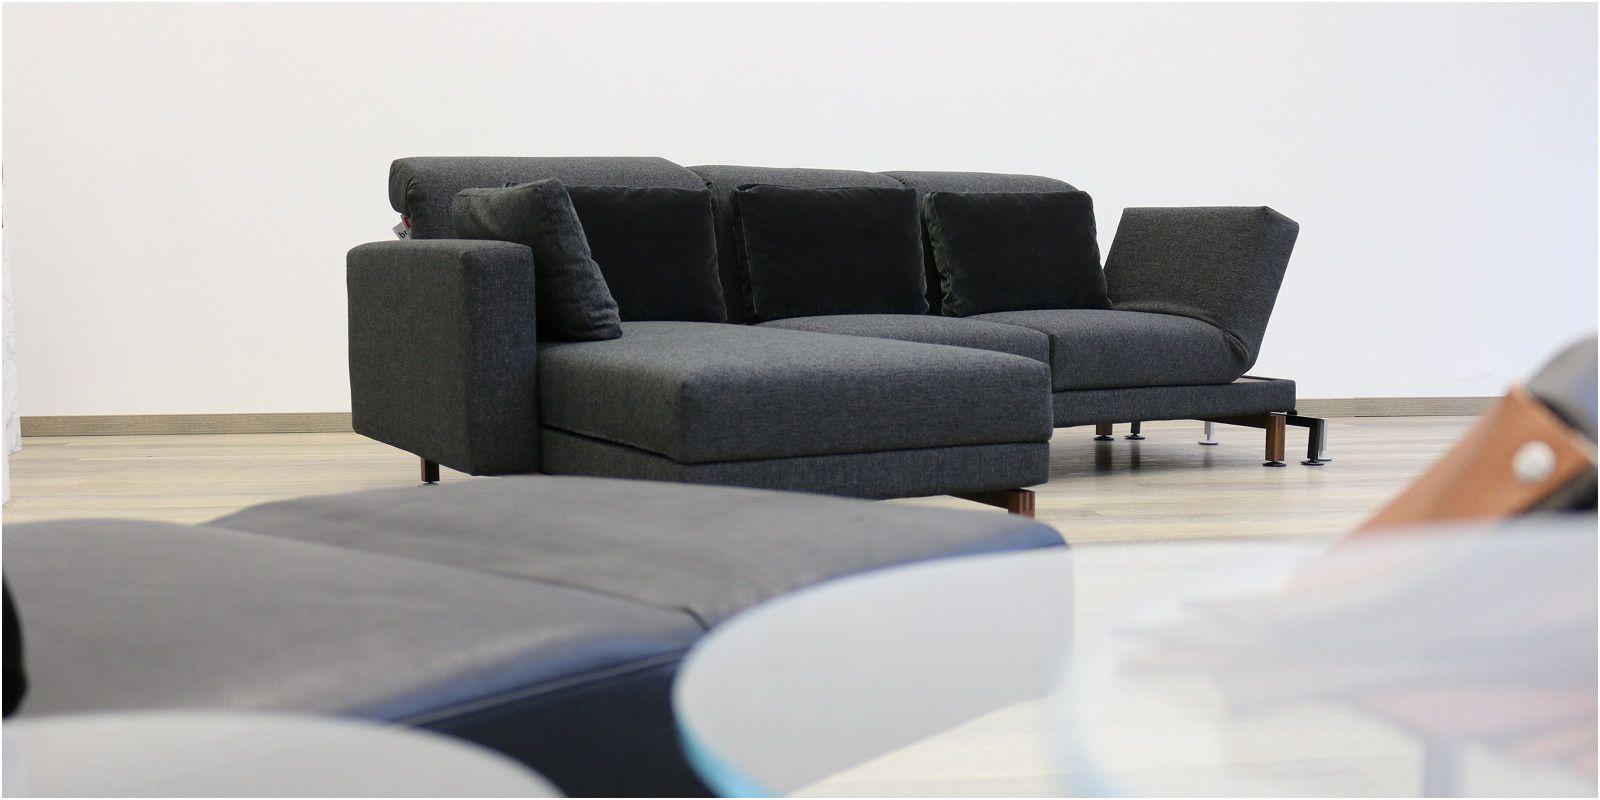 Freizeit Roller Mobelhaus Furniture Home Decor Decor